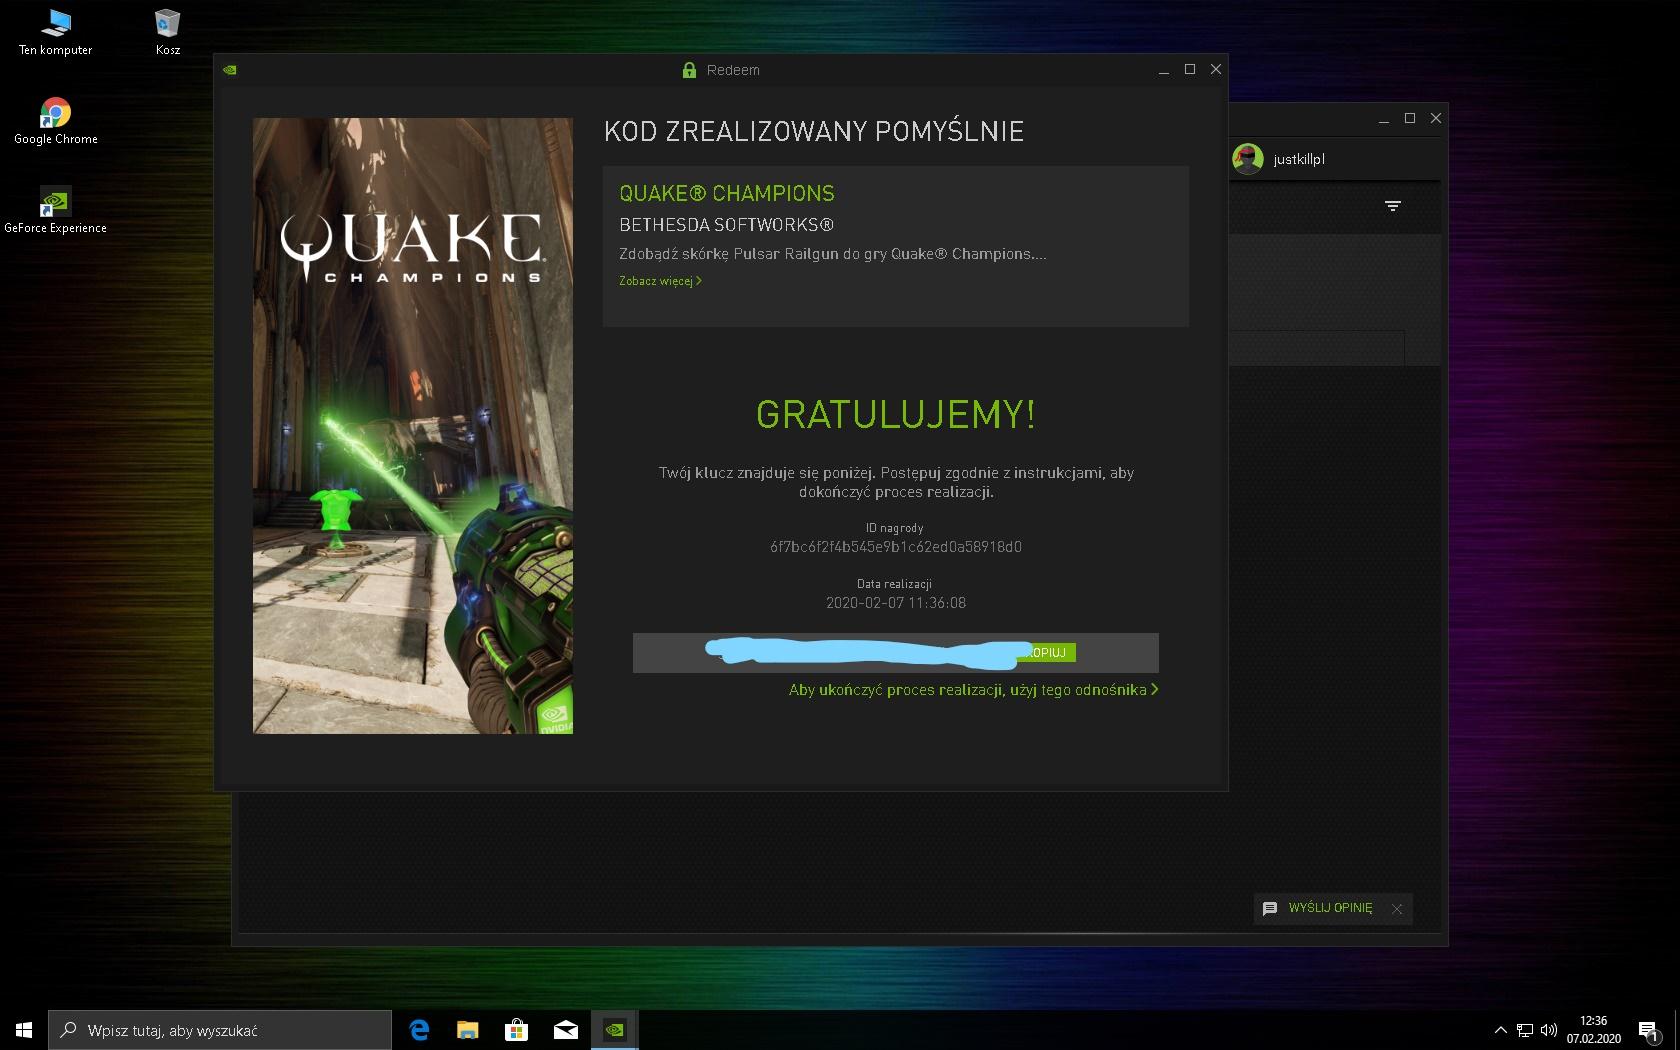 Nvidia Experience Darmowa Skórka do Quake Champions